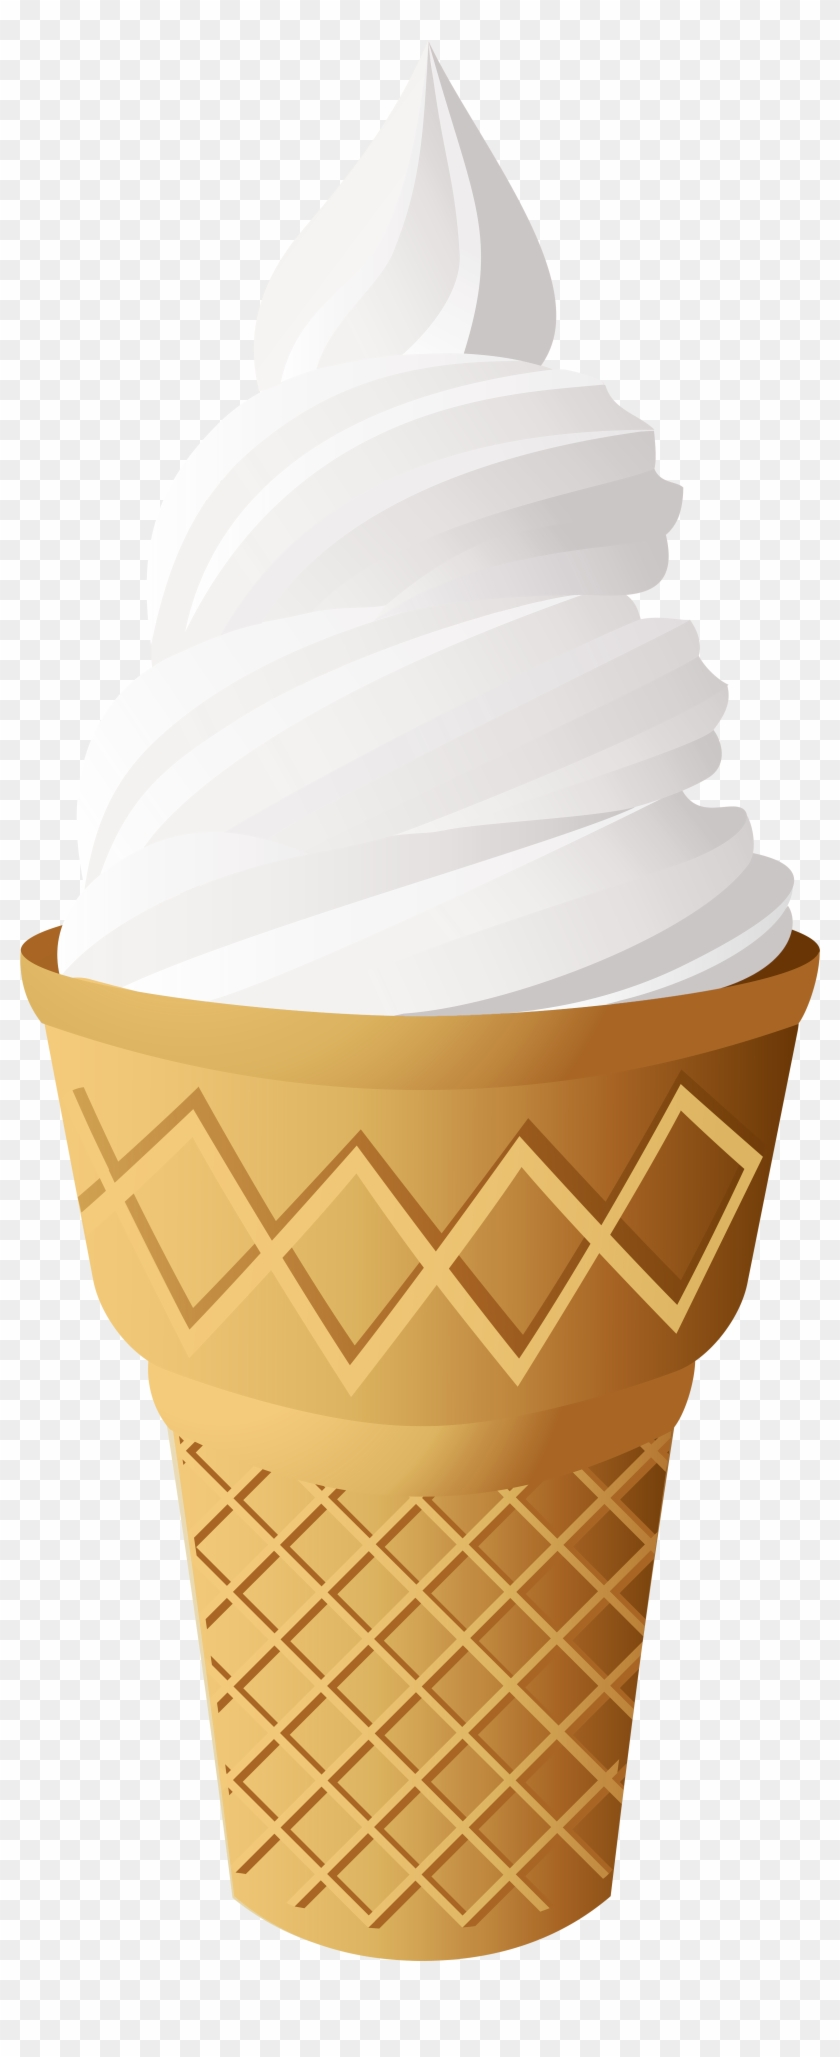 hight resolution of vanilla ice cream cone png clip art vanilla ice cream clipart